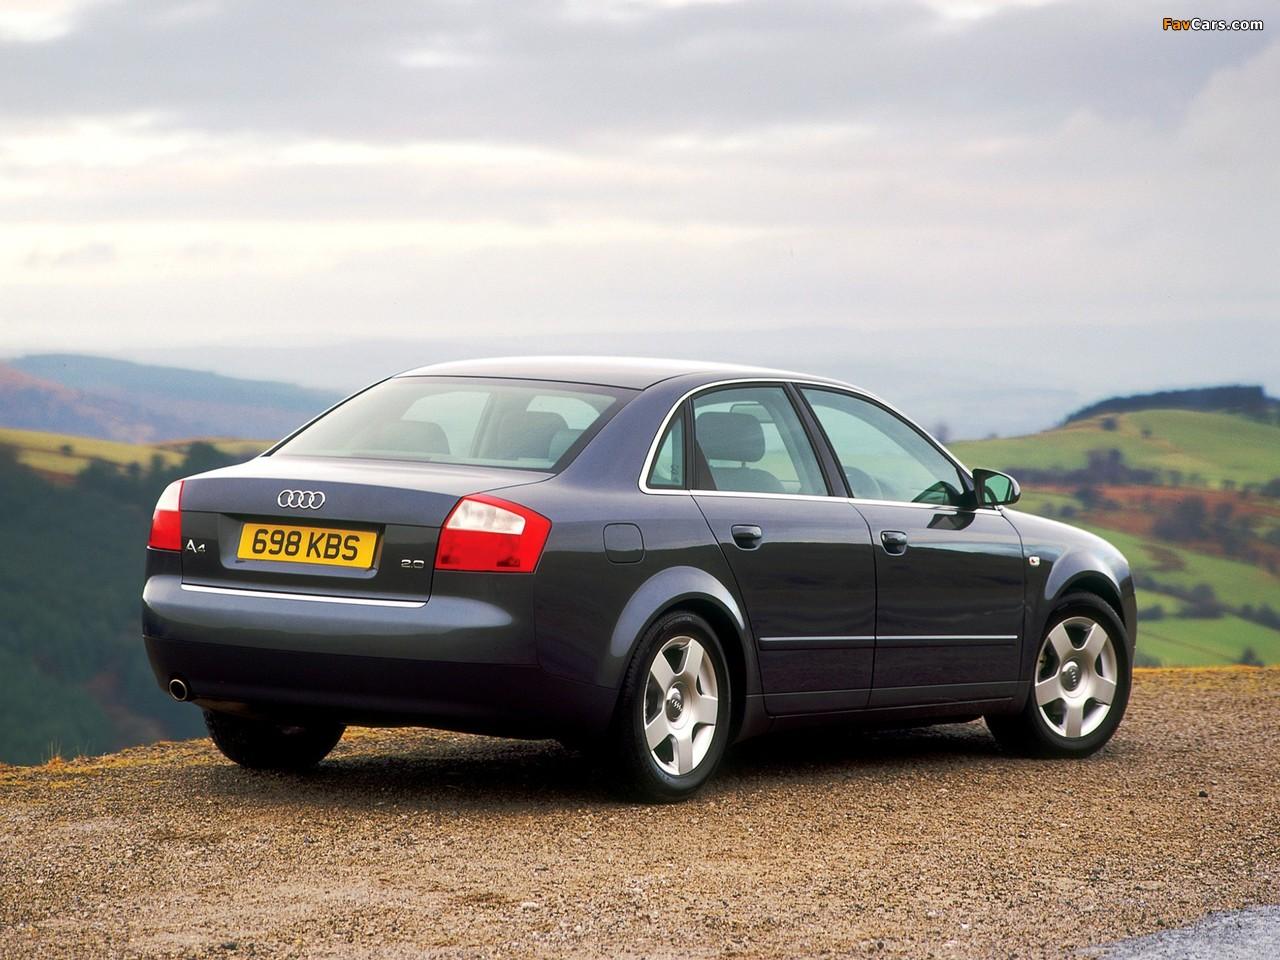 Audi A4 2 0 Fsi Sedan Uk Spec B6 8e 2000 2004 Pictures